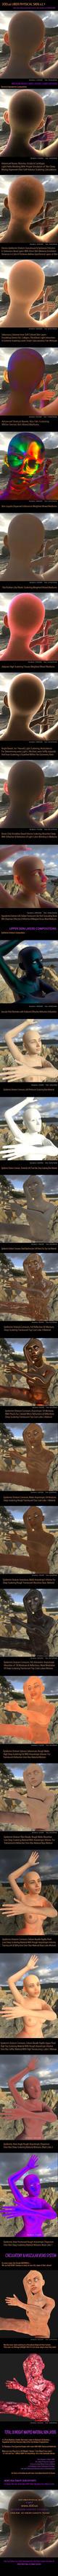 3DD.us UBER PHISICAL SKIN - DEVELOPMENT PAPERS v1 by SOULSSHINE